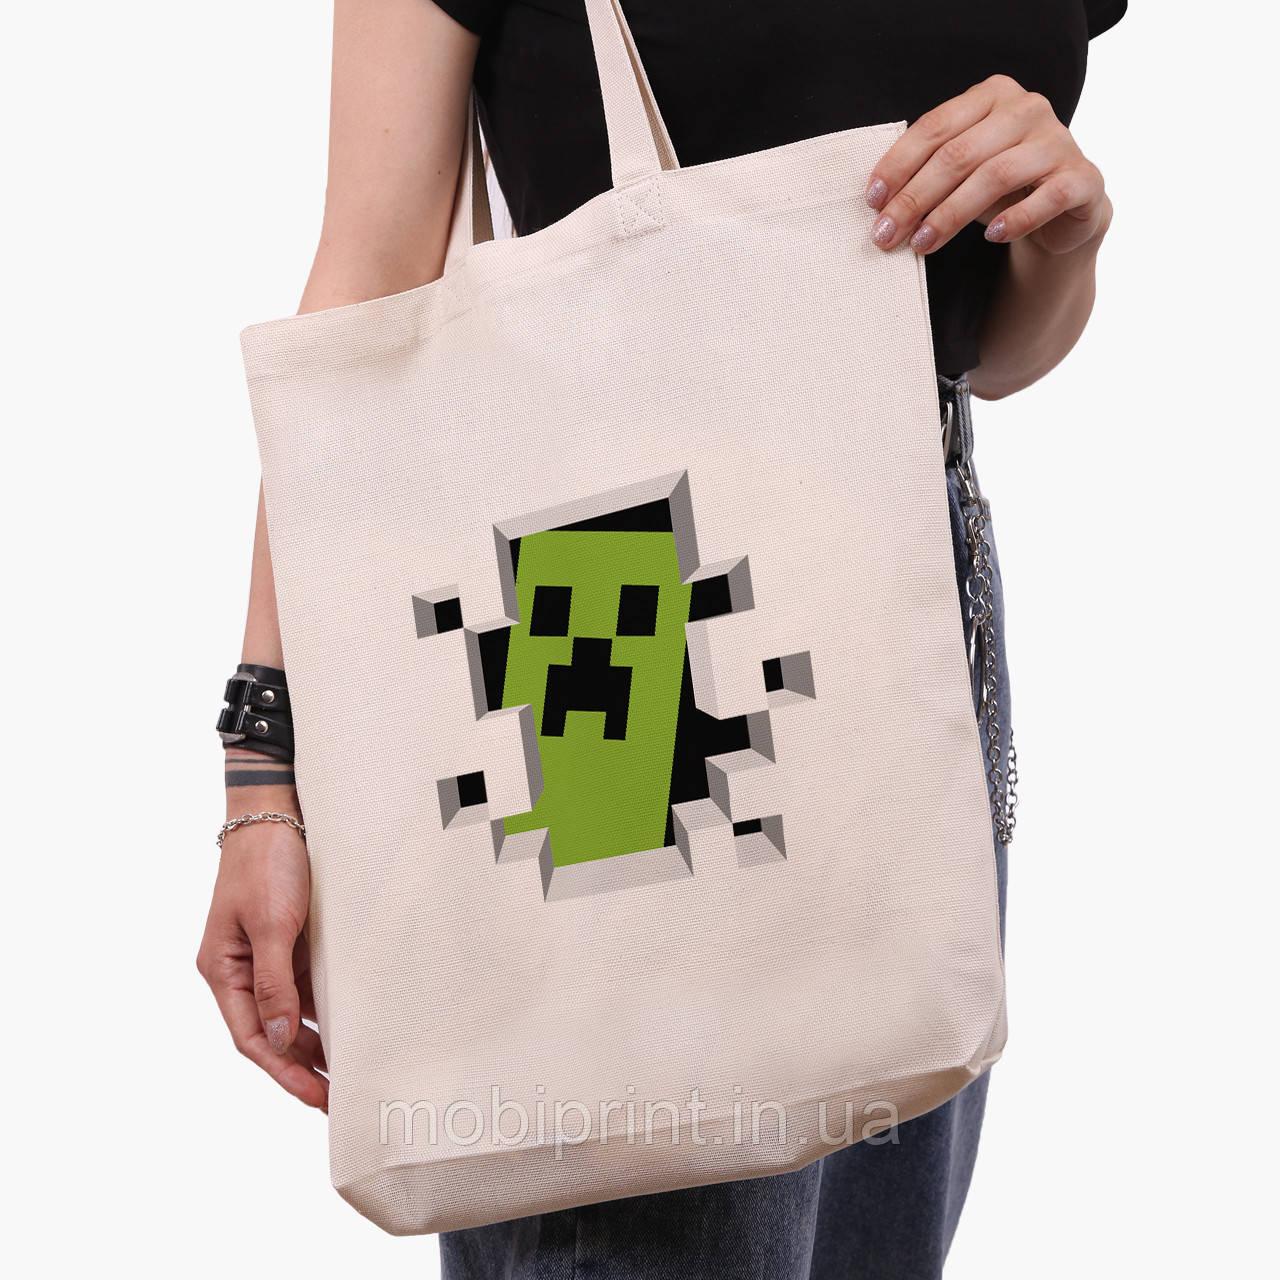 Еко сумка шоппер біла Майнкрафт (Minecraft) (9227-1709-1) экосумка шопер 41*39*8 см